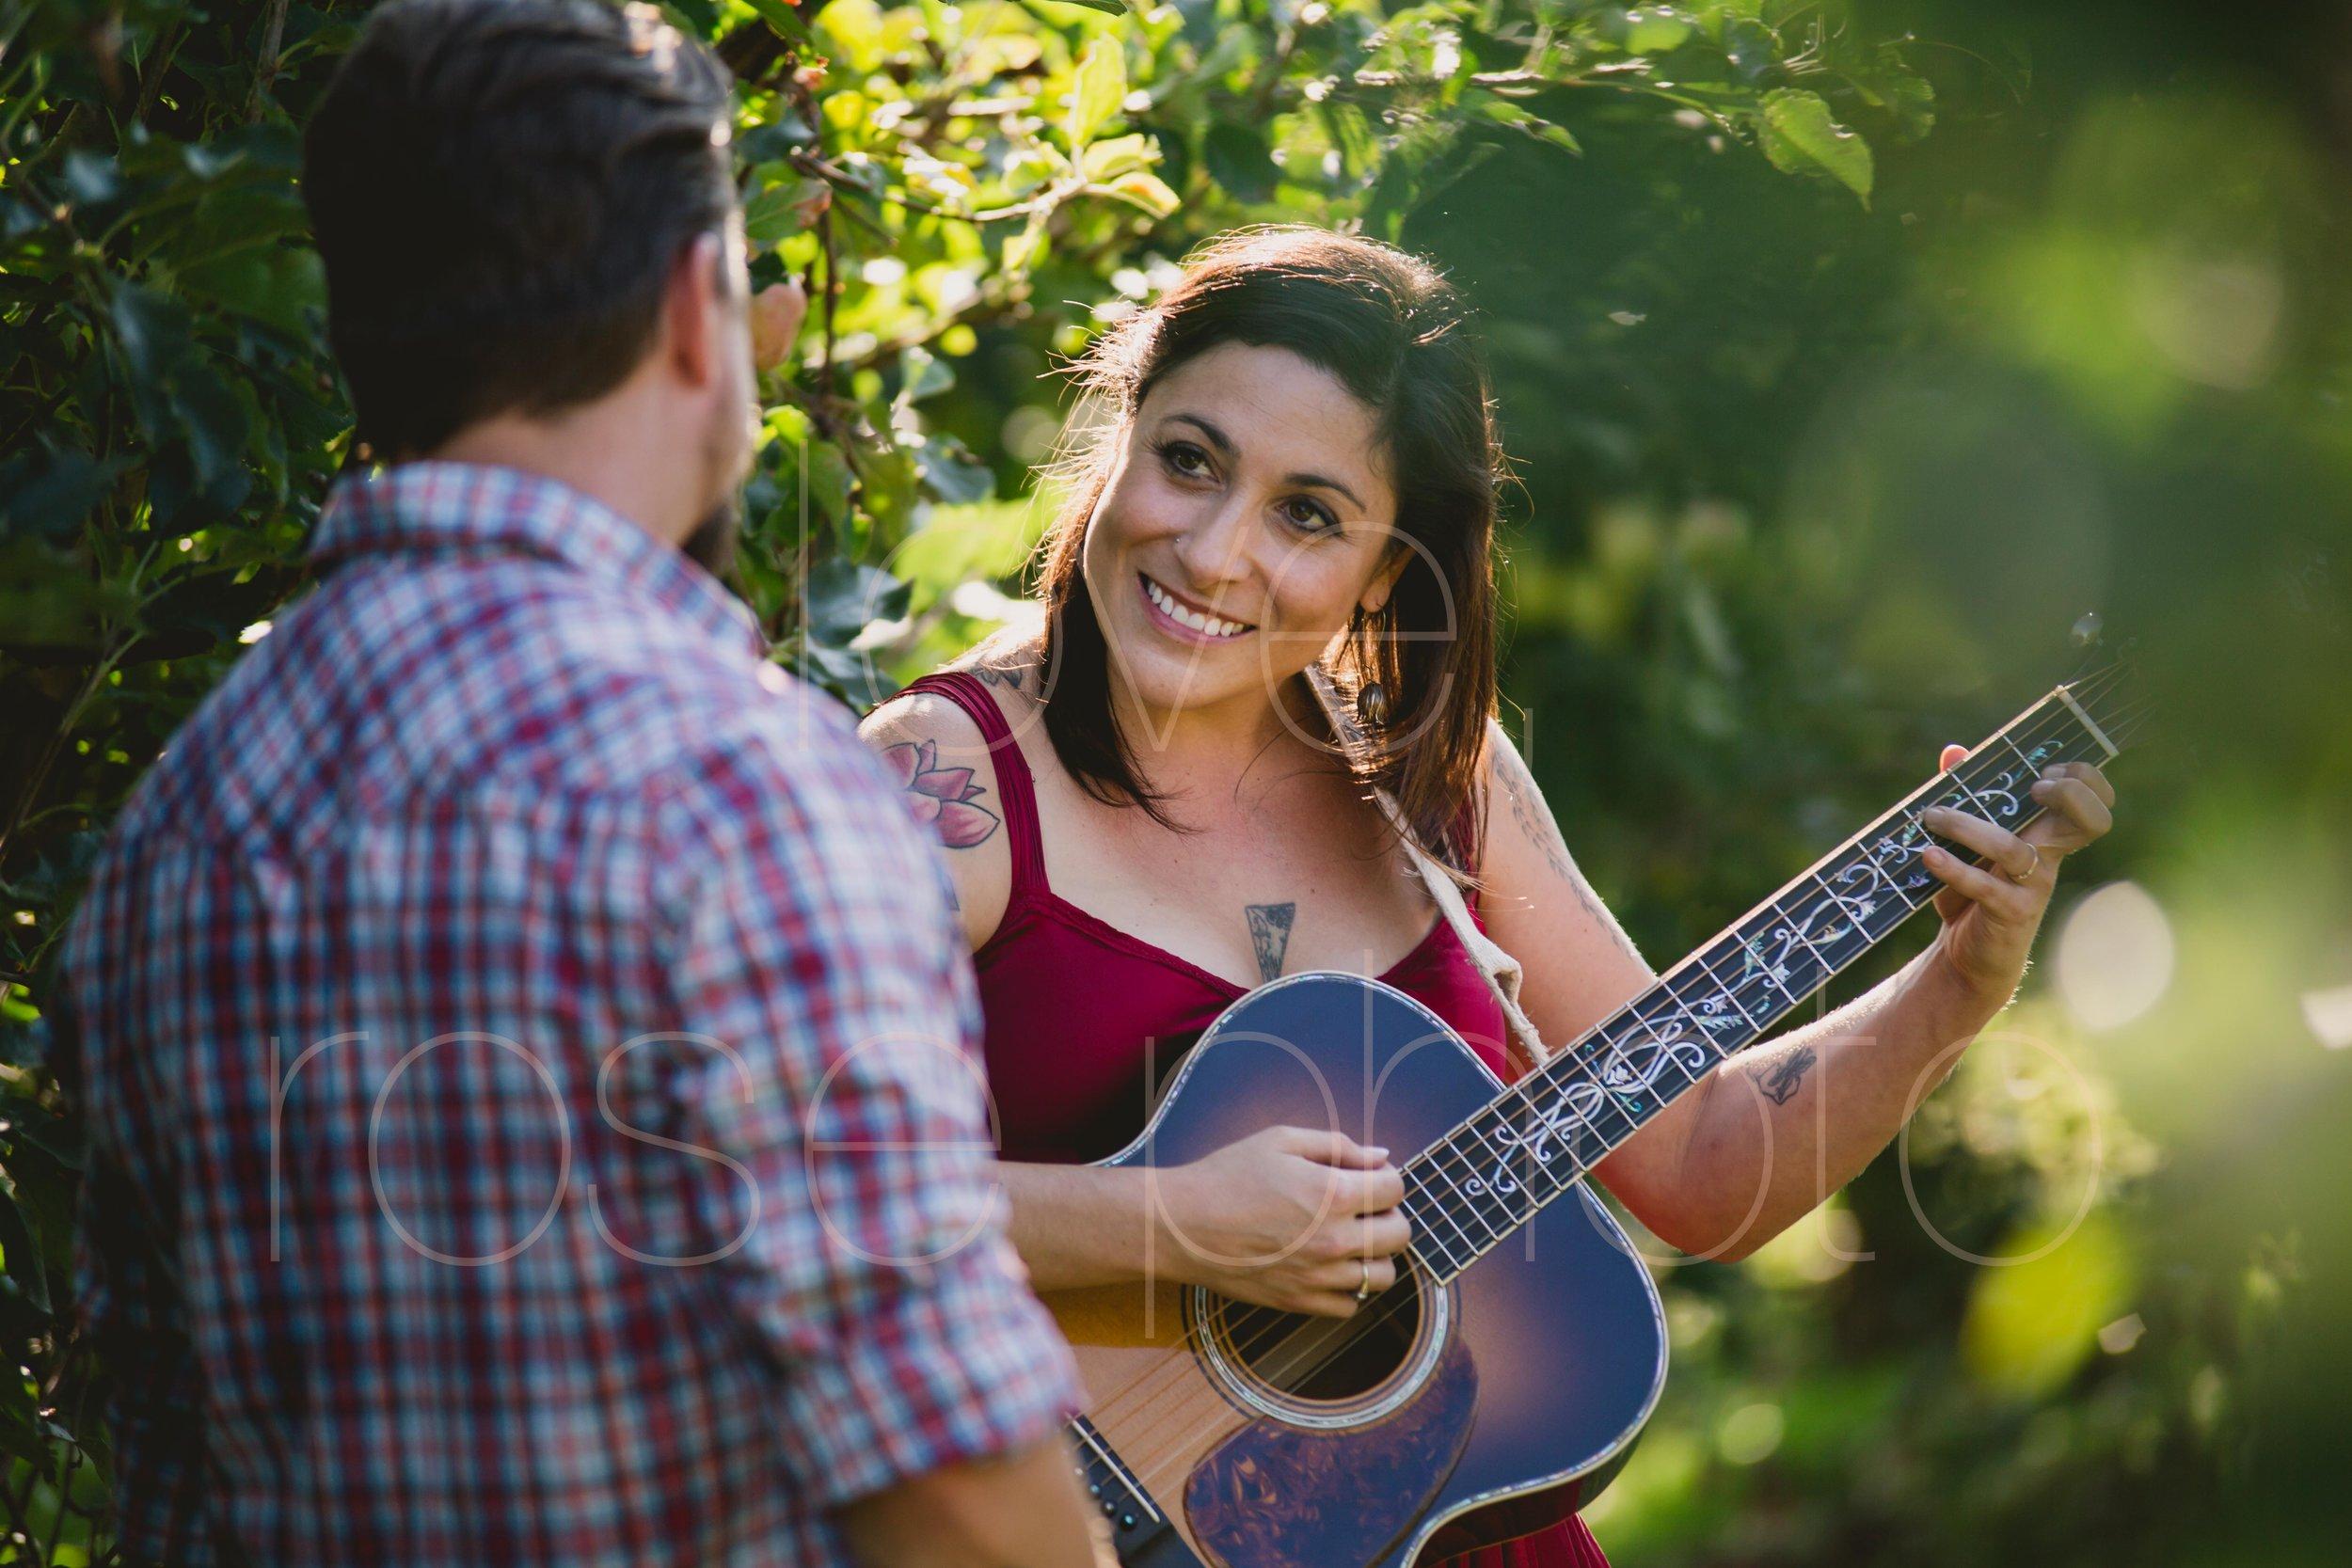 Jane Kramer Ashevegas Jason Sanford WNC Asheville wedding engagement shoot by Rose Photo-12.jpg